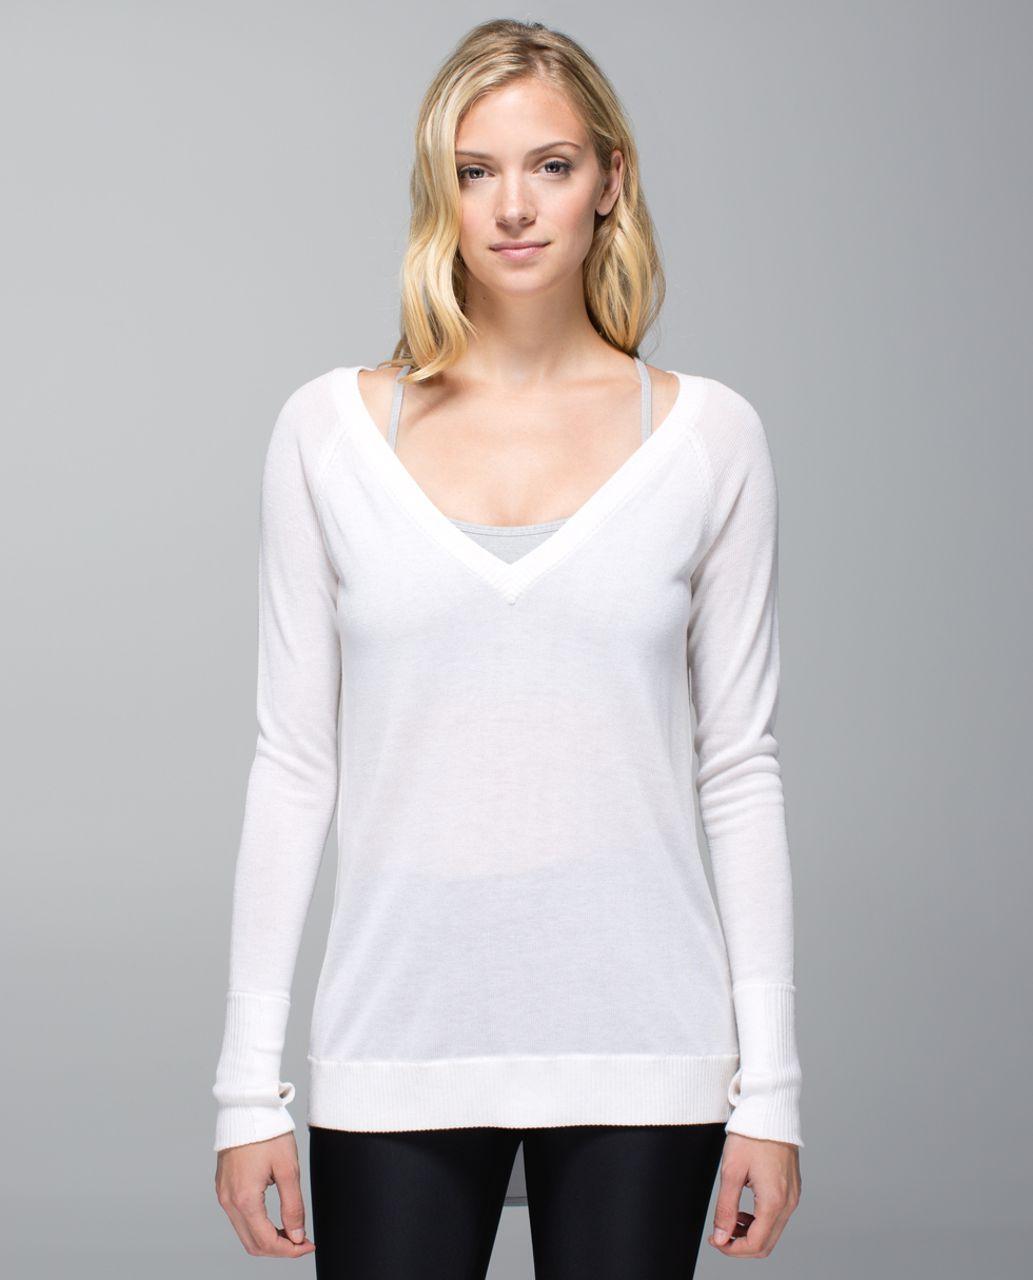 Lulus Popcorn Cream Pullover Sweater Top Size Medium